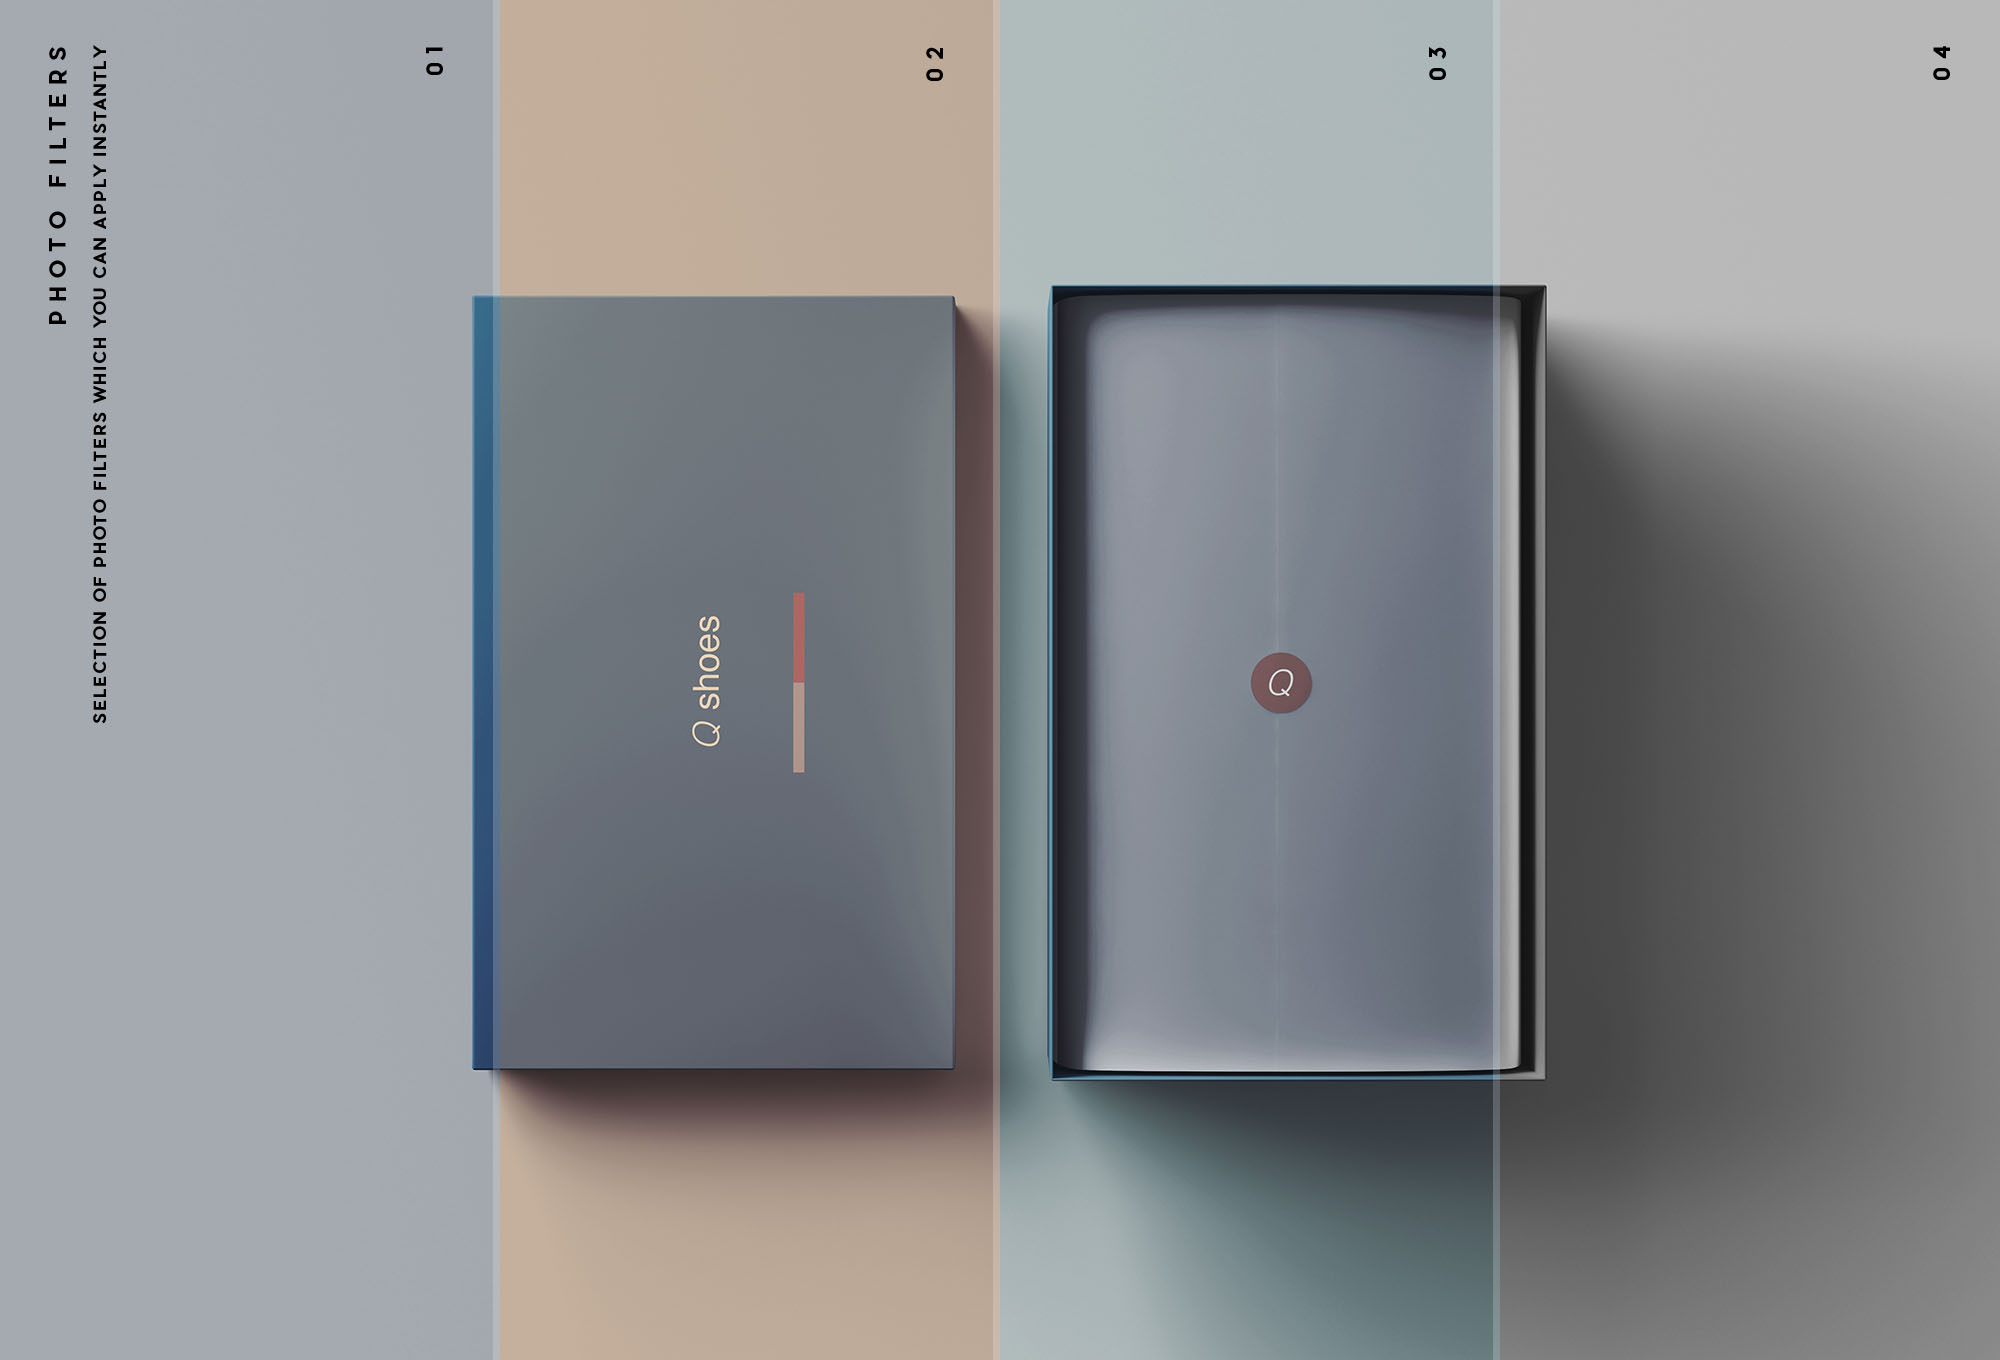 Shoe Box Mockup Filters